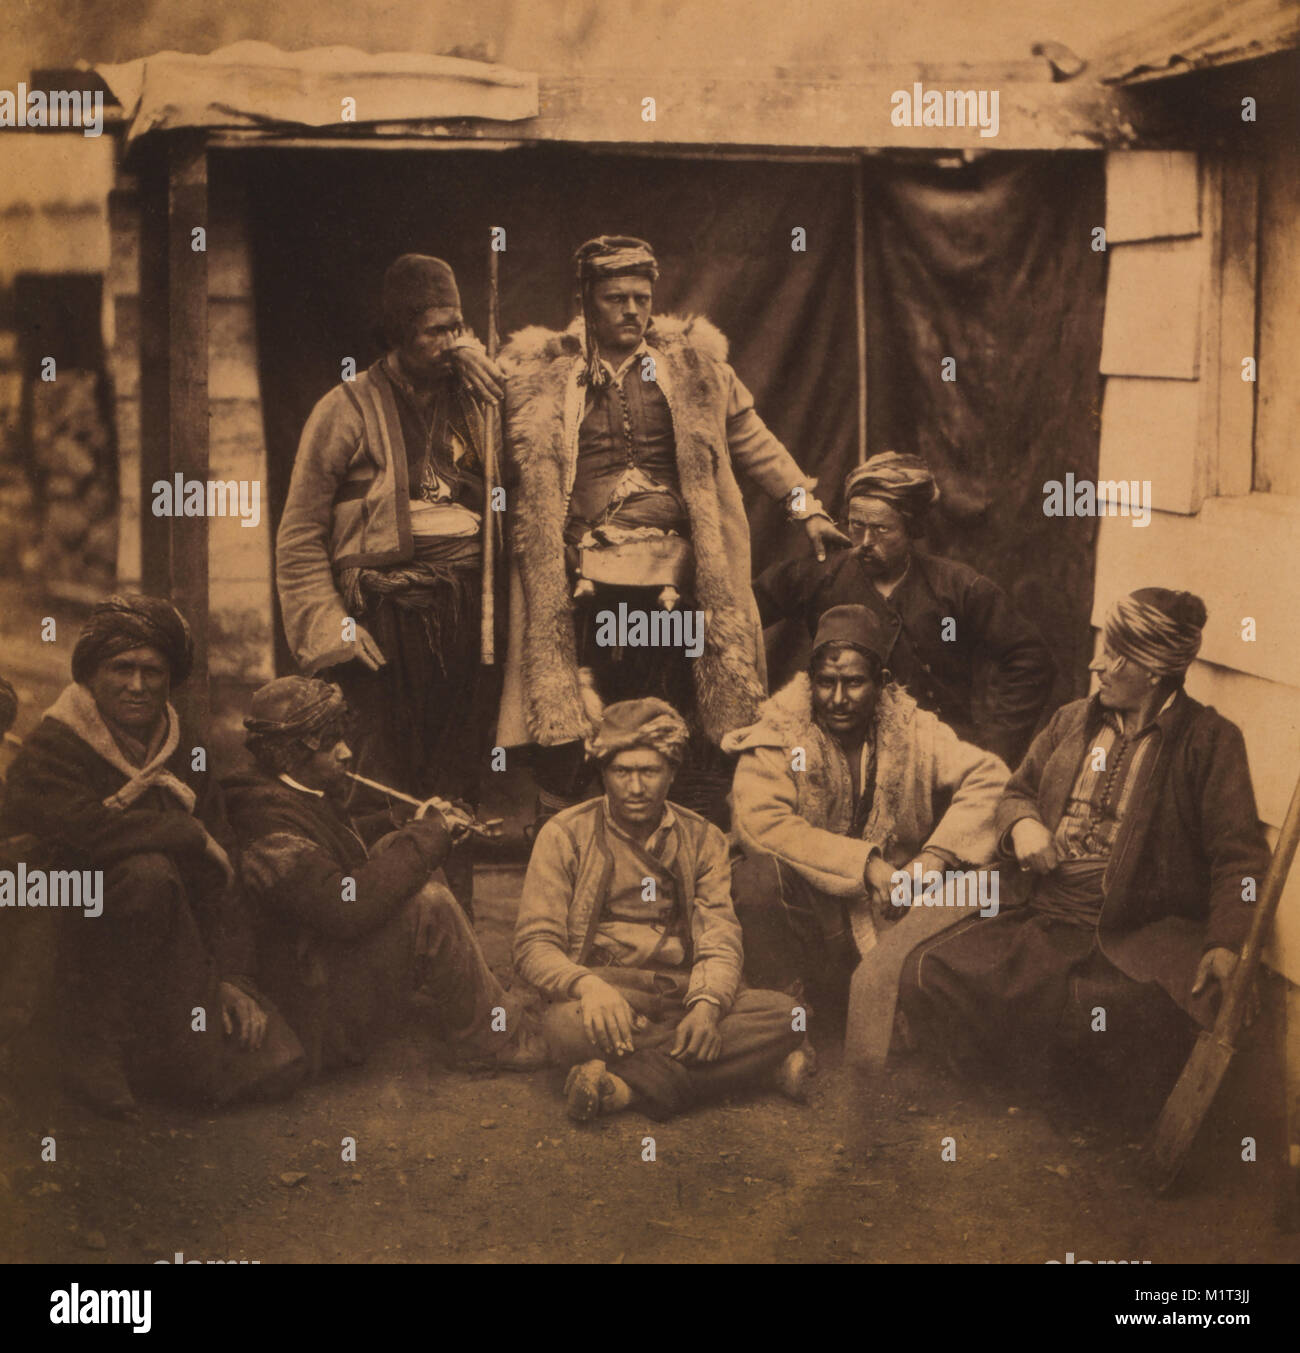 Group of Croat Laborers, Portrait, Crimean War, Crimea, Ukraine, by Roger Fenton, 1855 - Stock Image